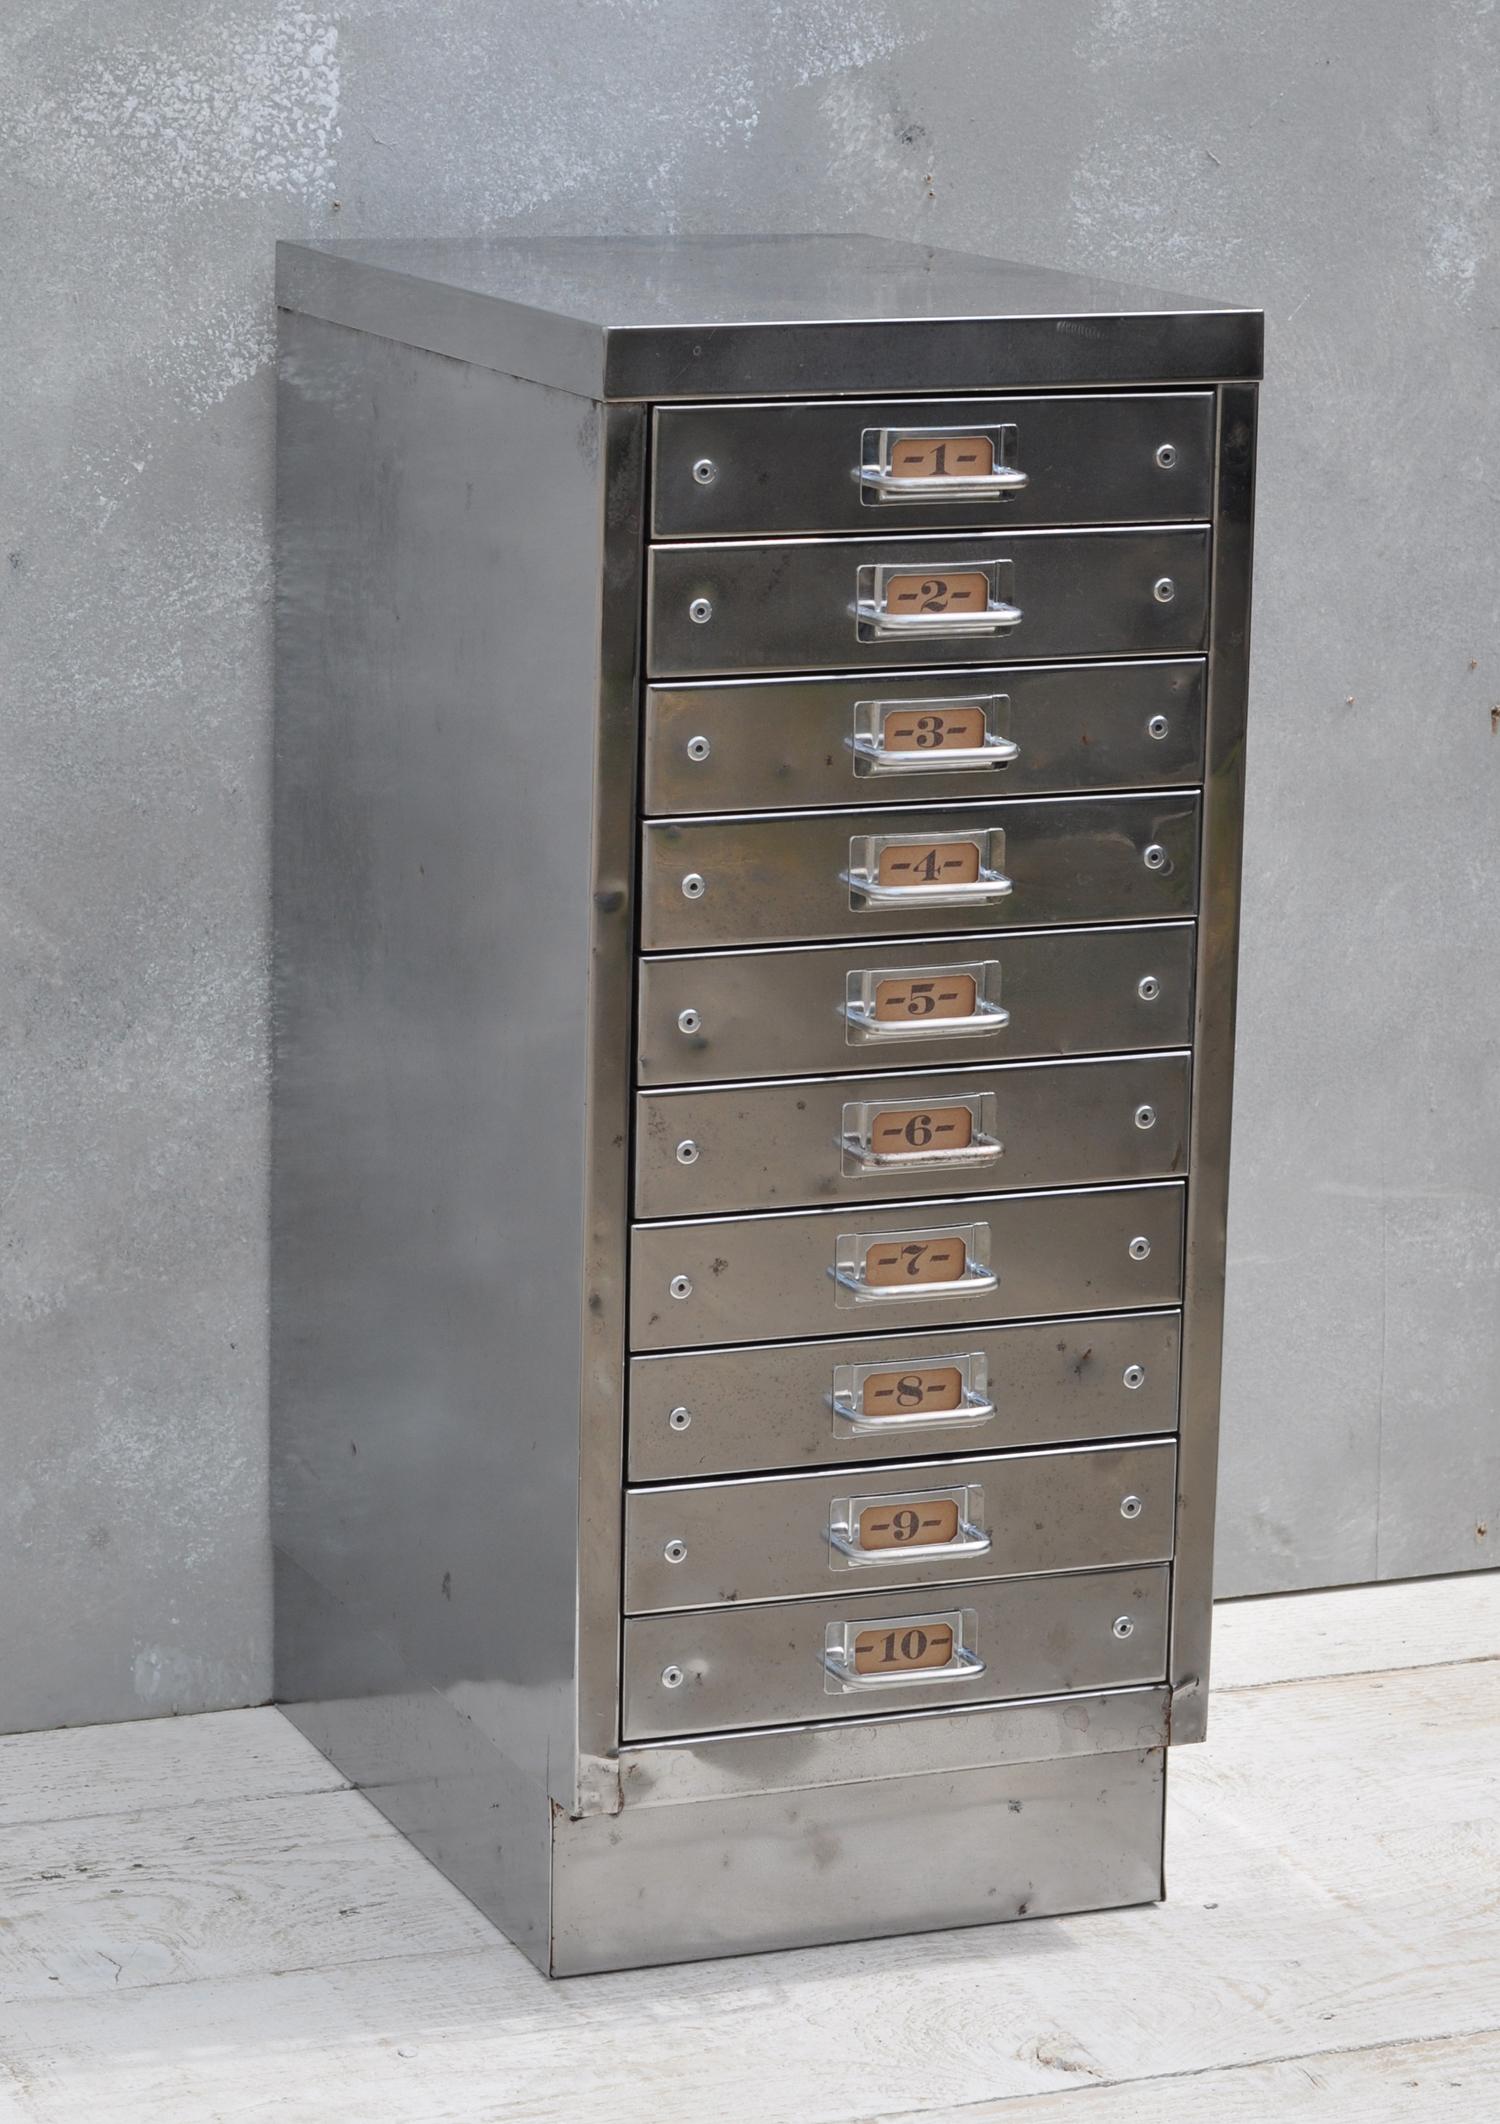 Vintage Industrial Steel Filing Cabinet 10 Drawer Home